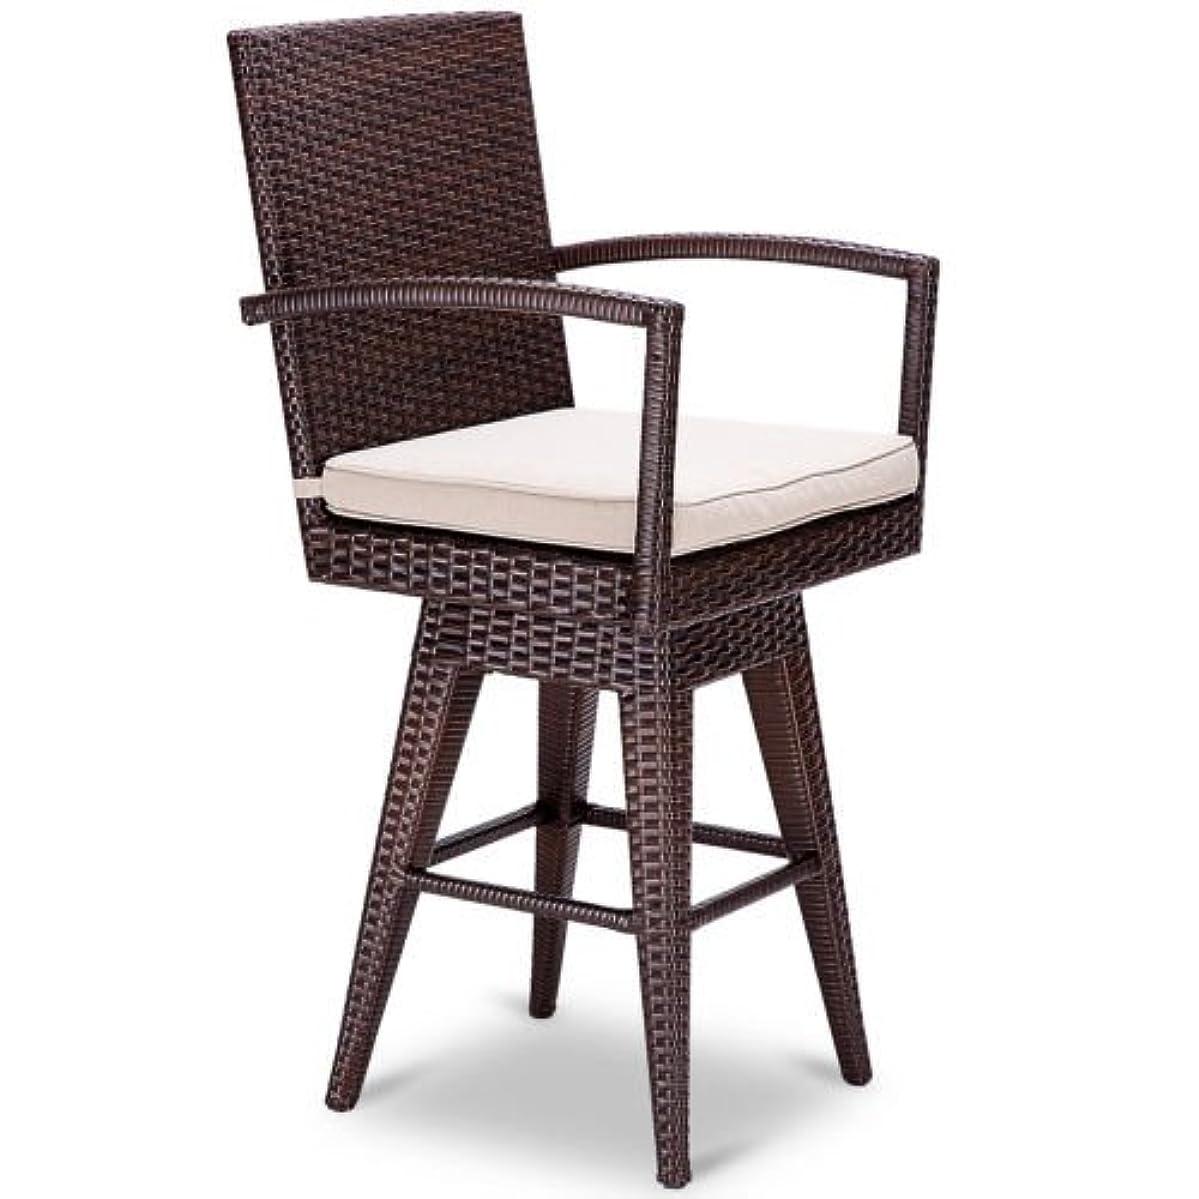 Stark Item Outdoor Wicker Swivel Bar Stool Chair Patio Backyard Furniture Seat Cushion